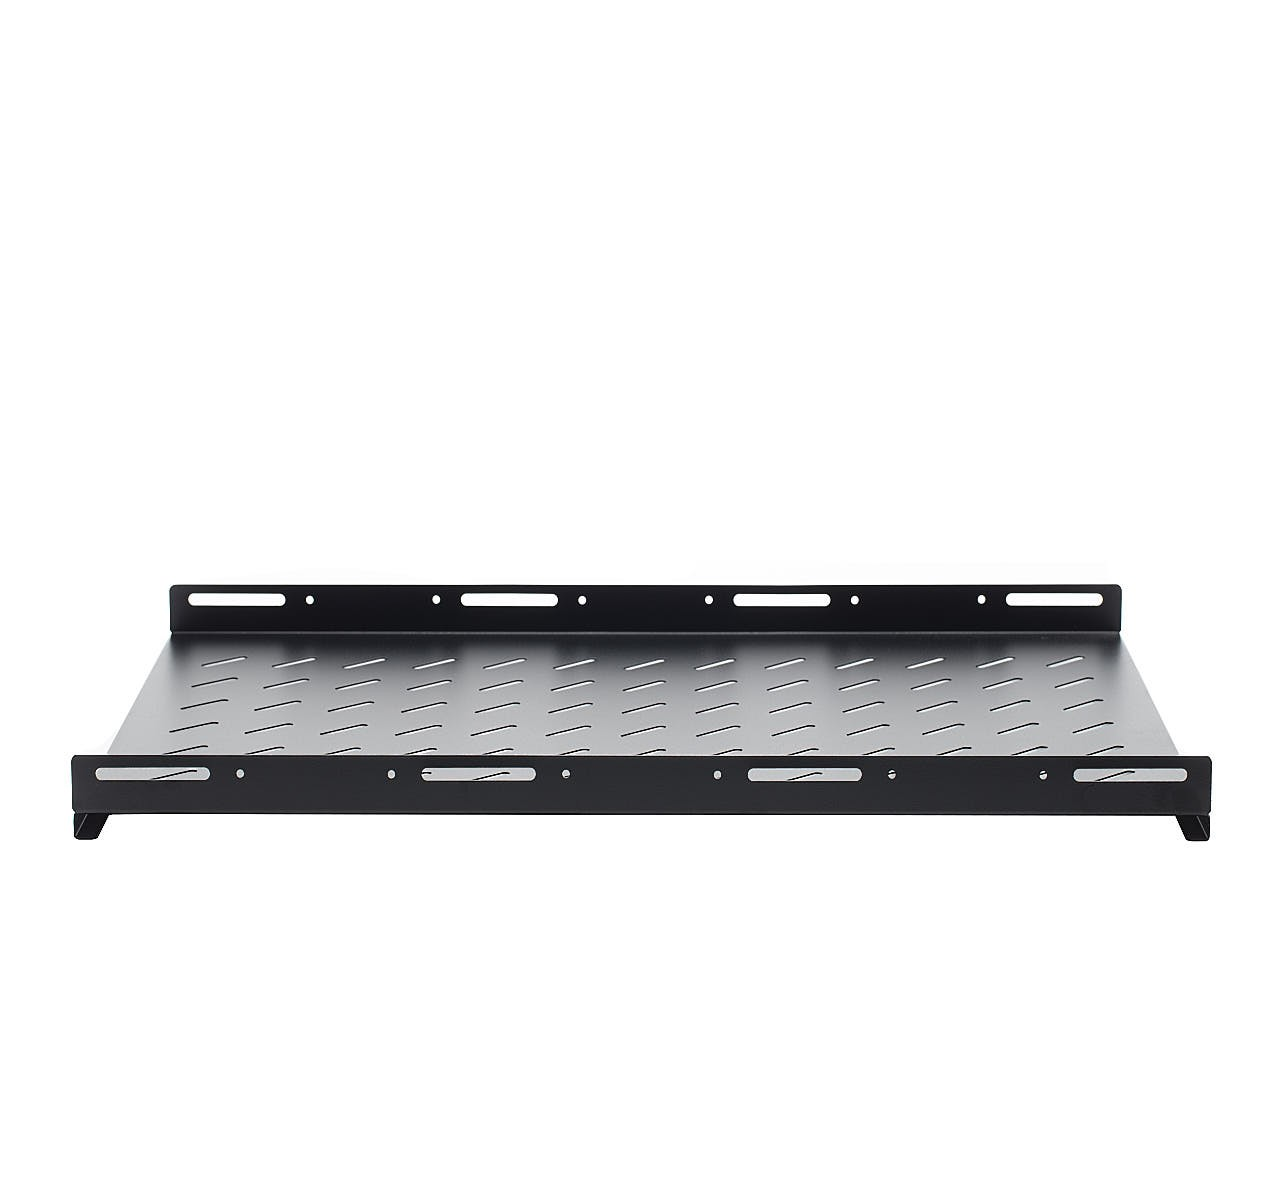 4cabling 1ru Fixed Shelf For 1000mm Deep Wall Mount Server Rack 002 003 1001